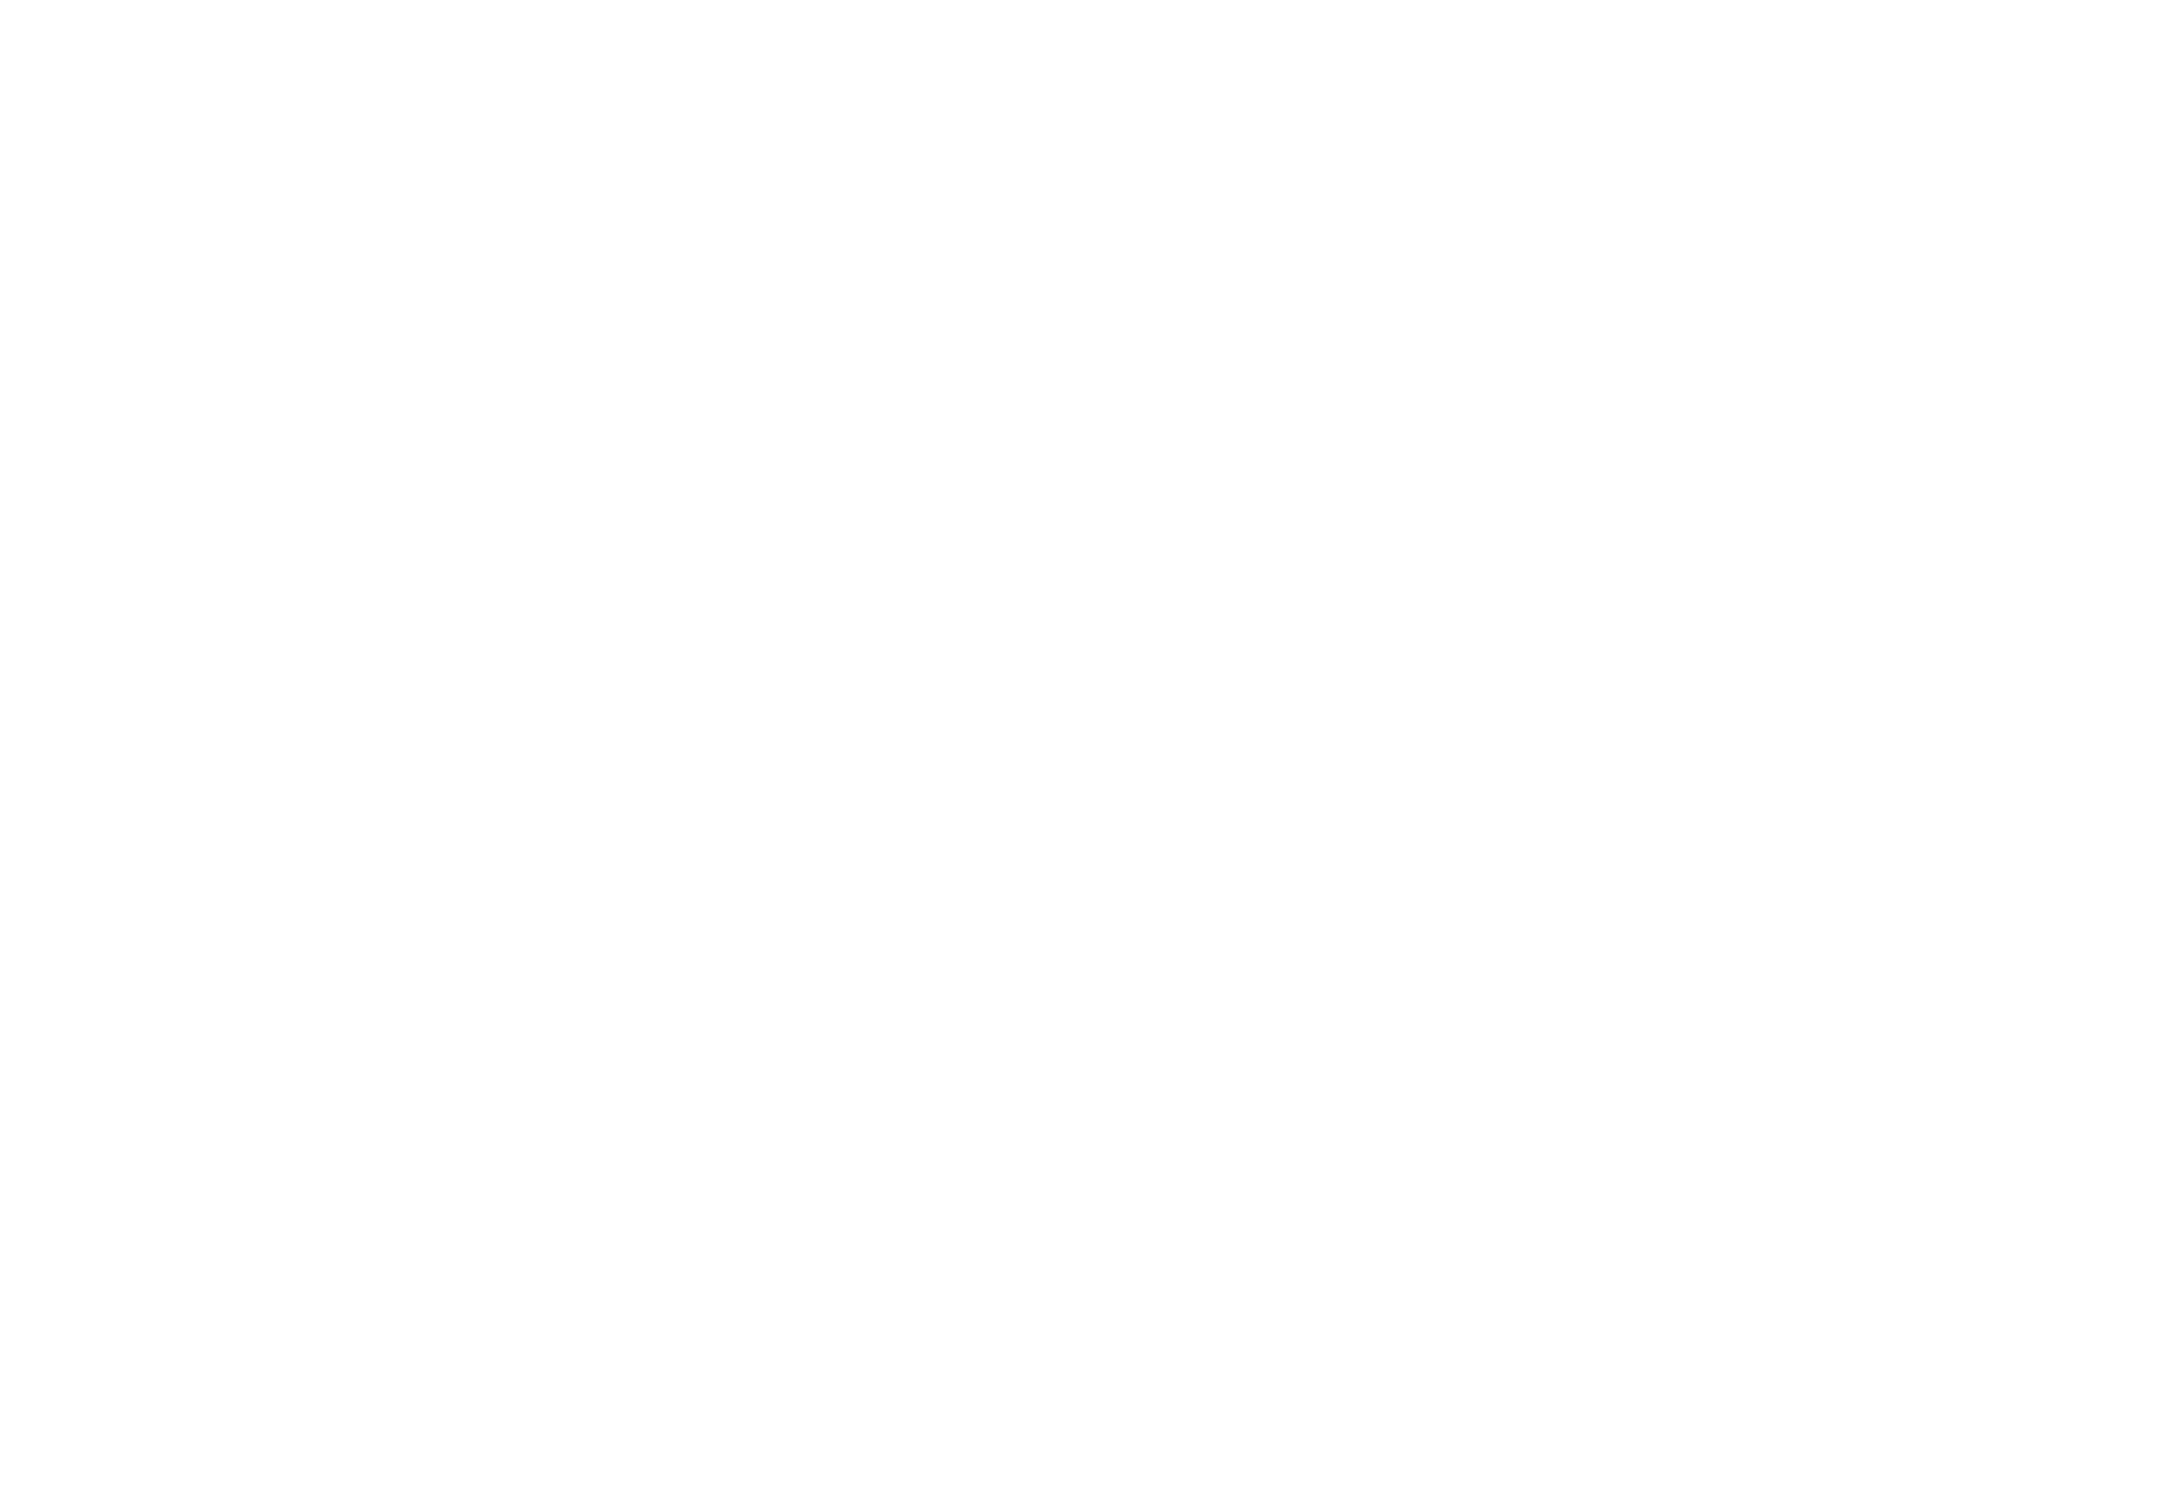 COOK+HOUSE+LOGO+NEWCASTLE+OUSEBURN